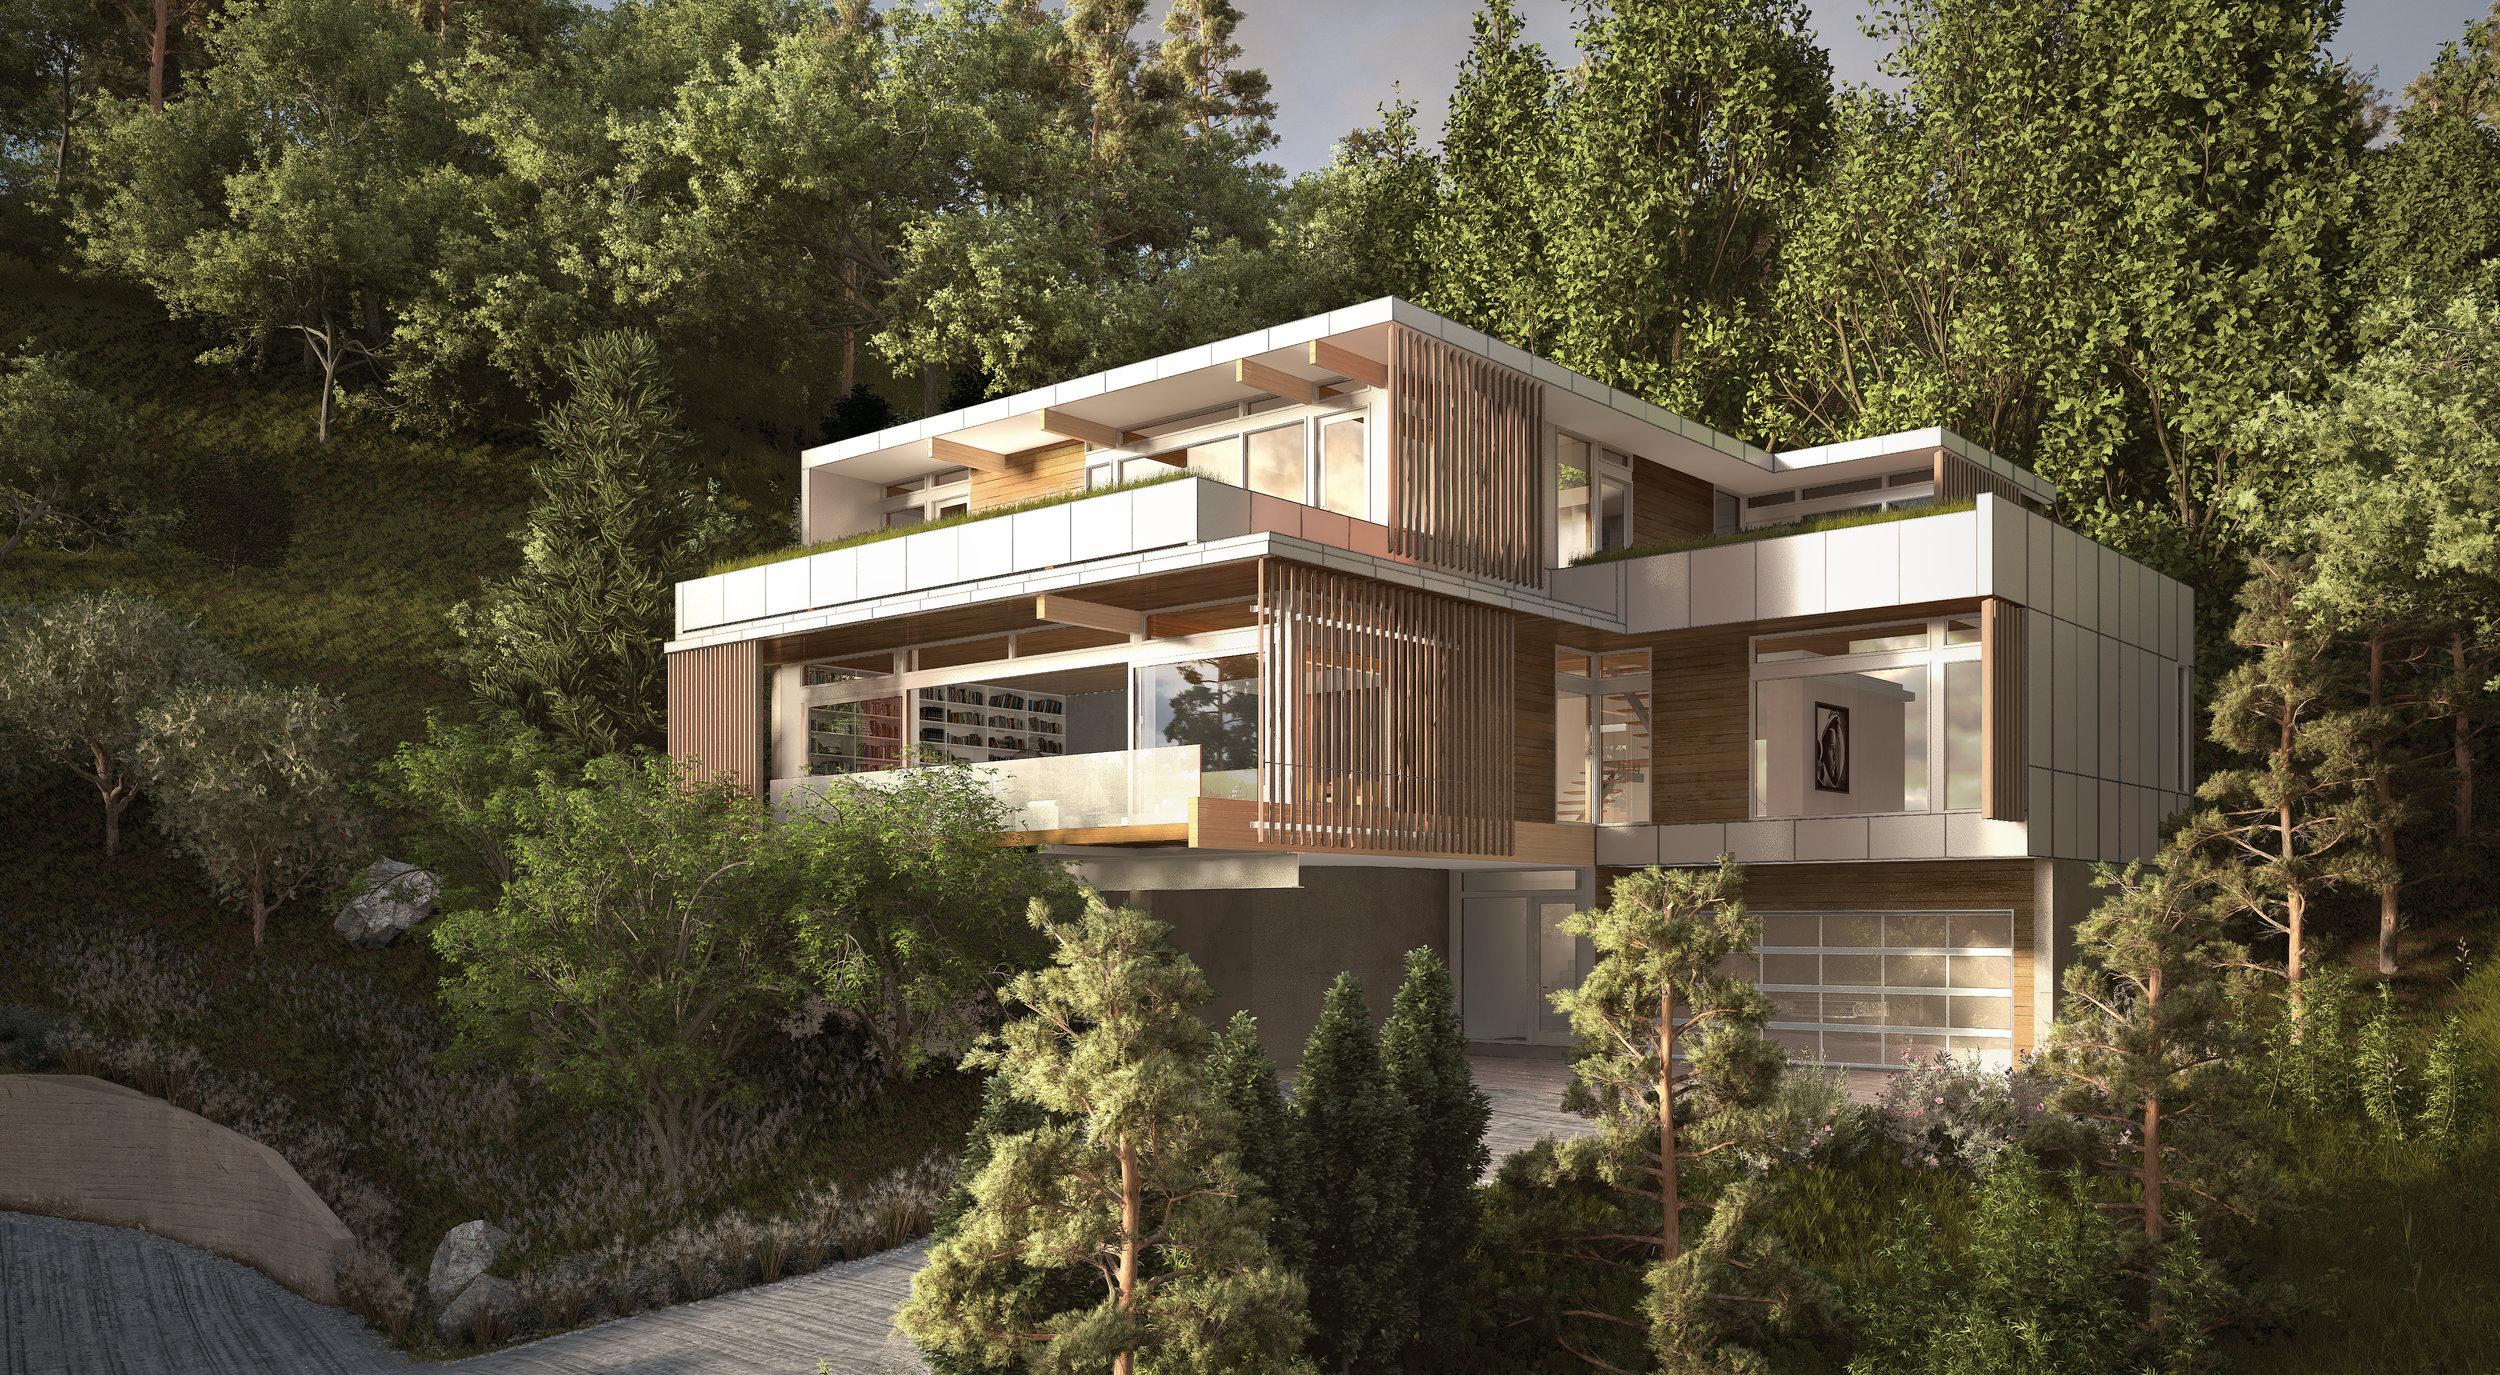 turkel_design_modern_prefab_home_mill_valley_california_rendering.jpg